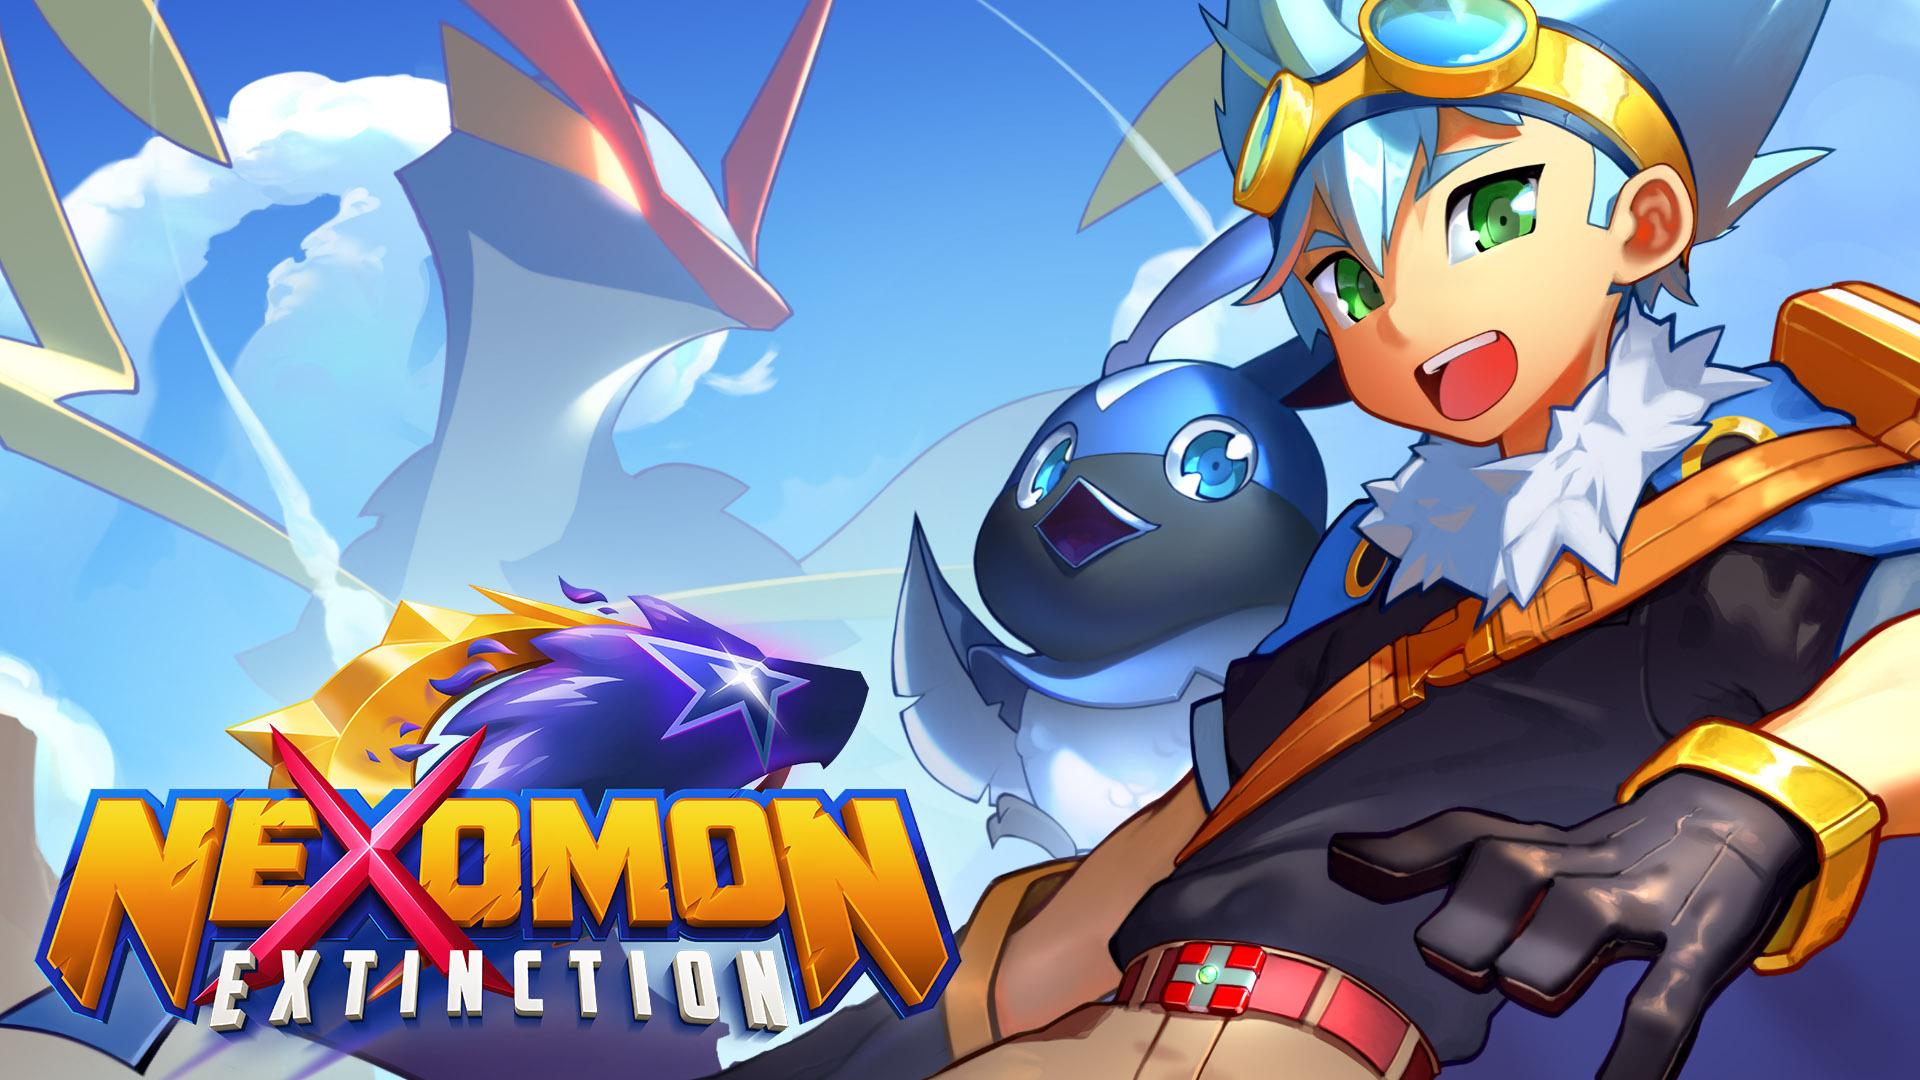 Nexomon: Extinction - Nintendo Switch  - Digital eShop, Ends March 1st $15